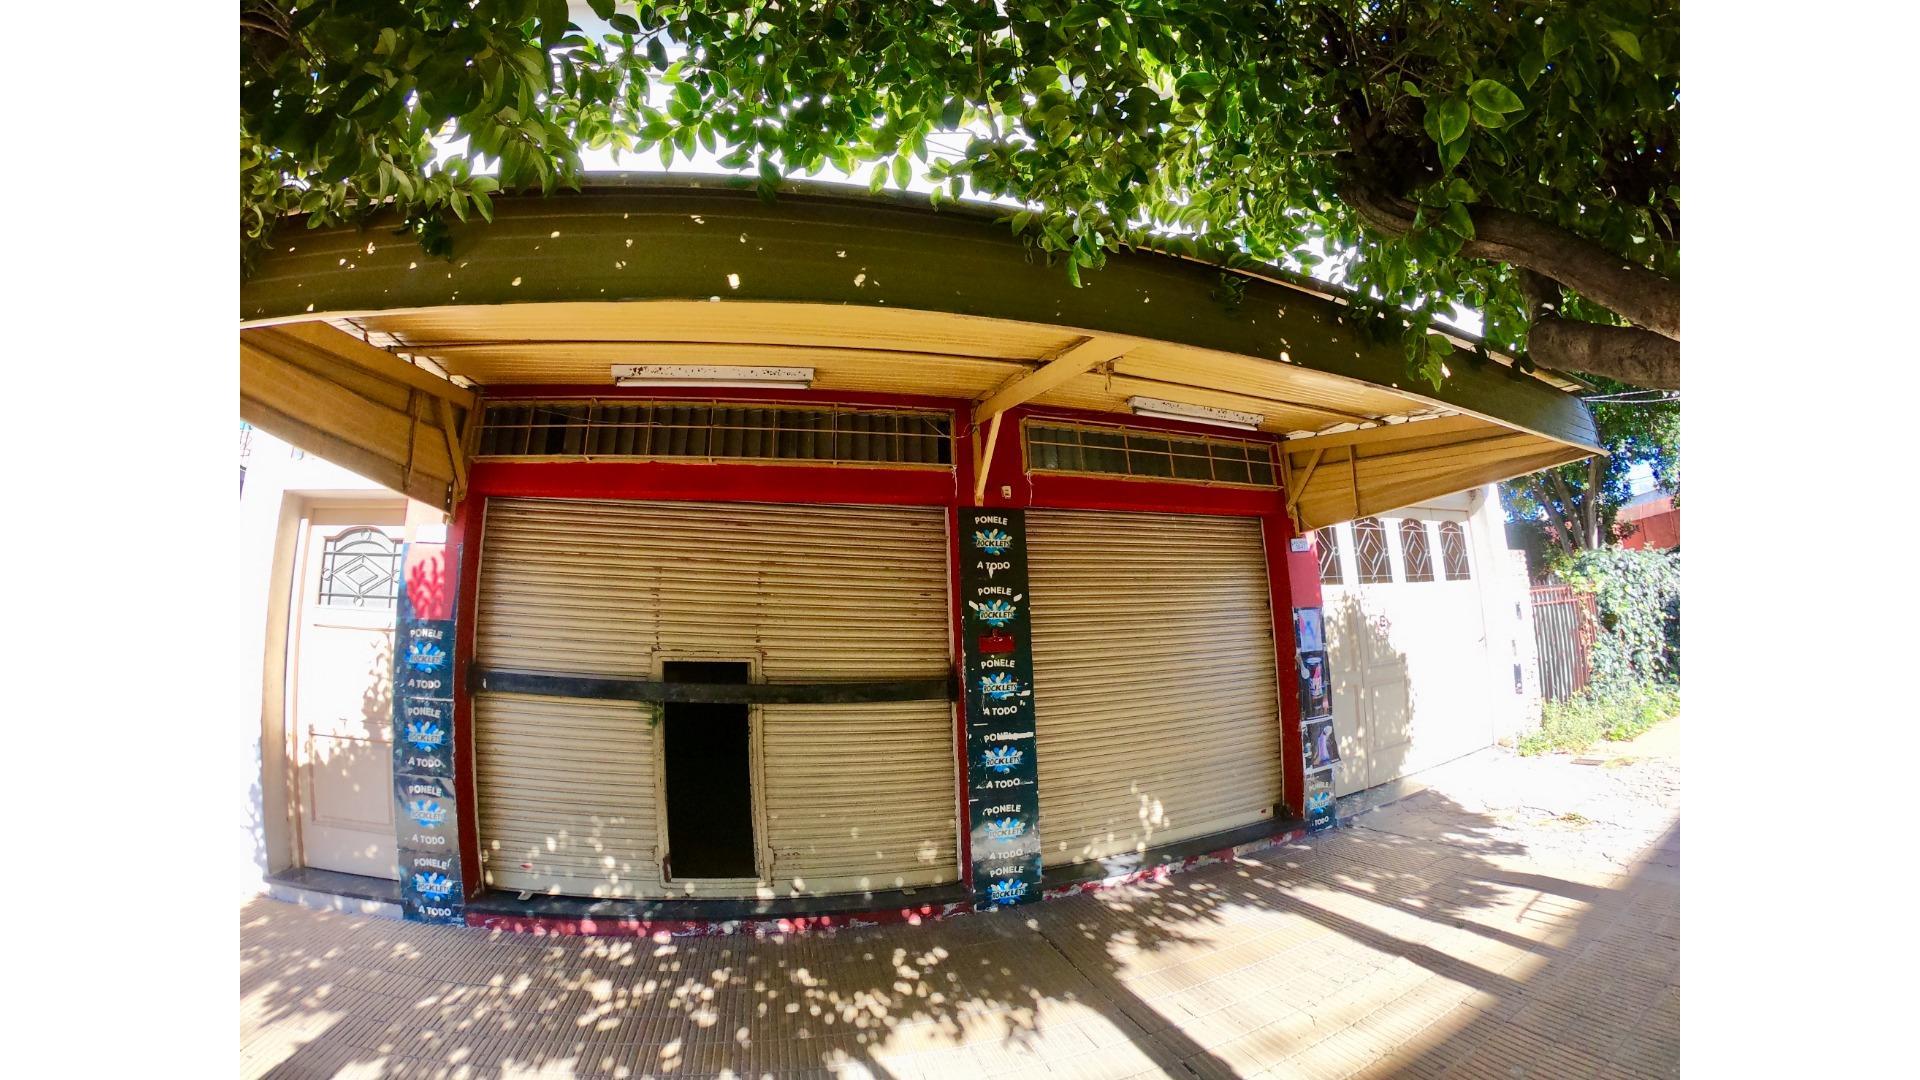 Las Heras 1800 - $ 8.000 - Local Alquiler